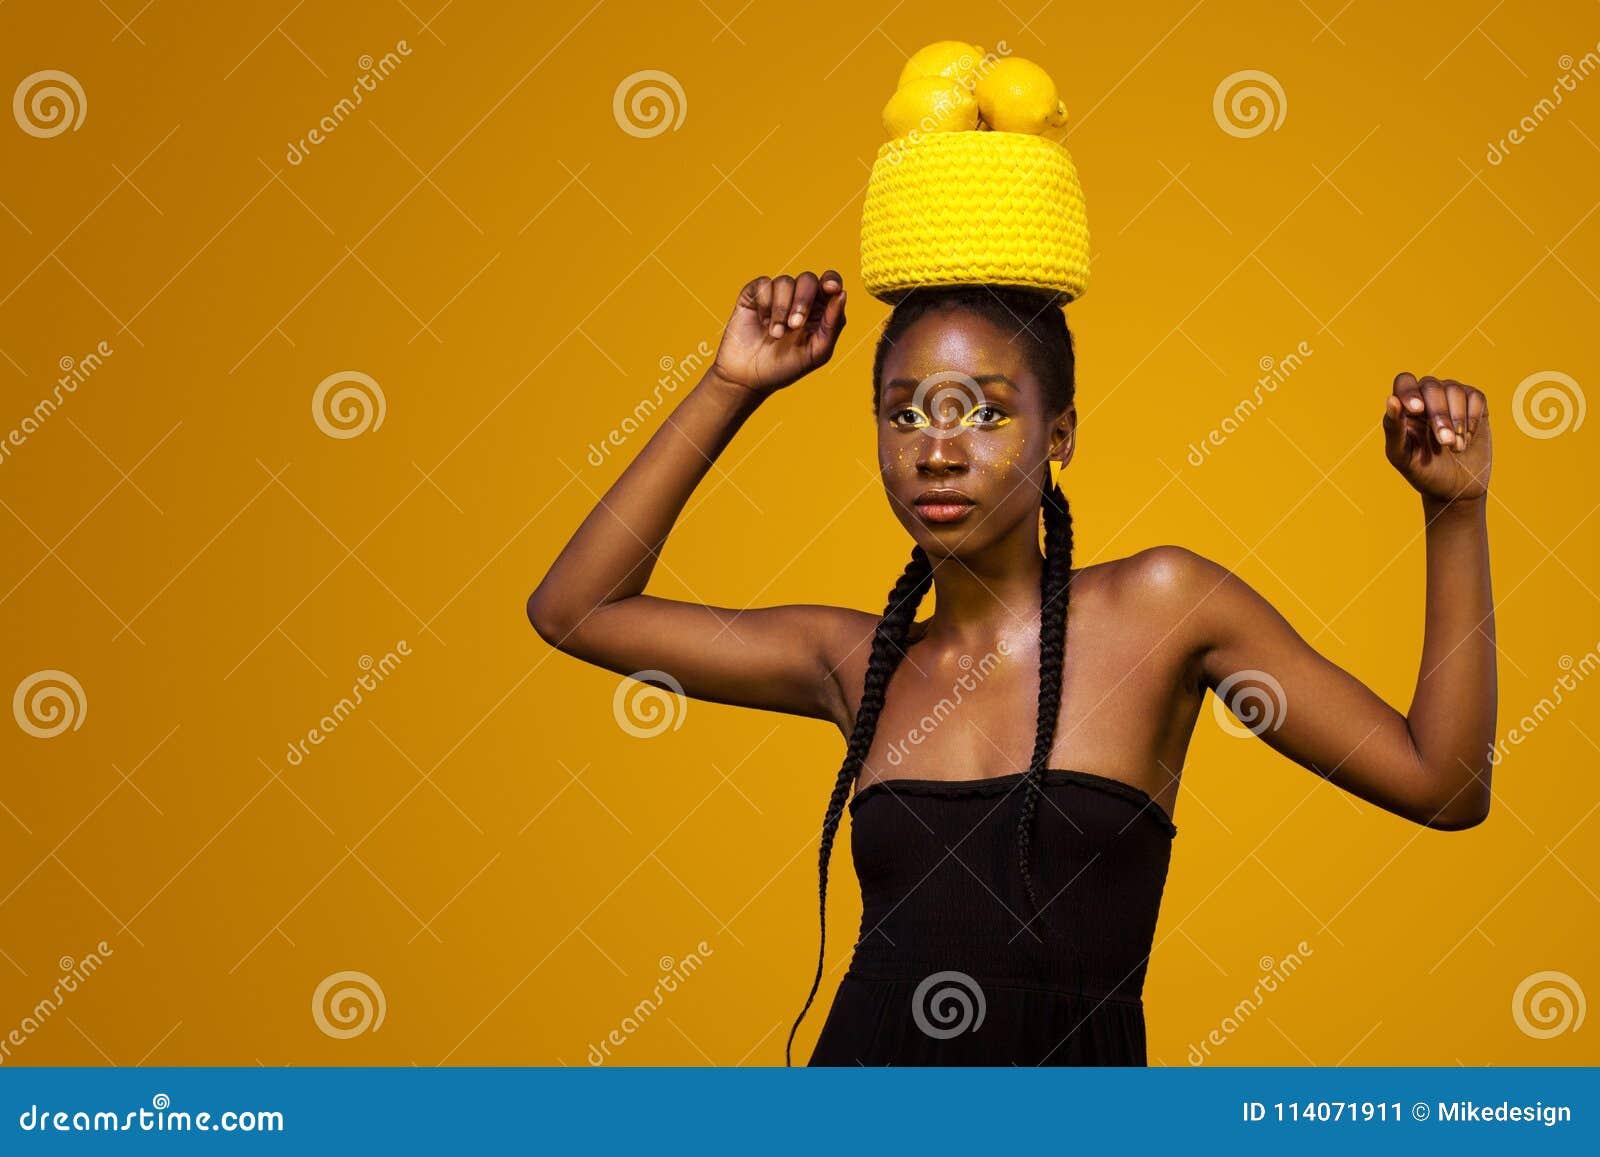 Gladlynt ung afrikansk kvinna med gul makeup på henne ögon Kvinnlig modell mot gul bakgrund med gula citroner